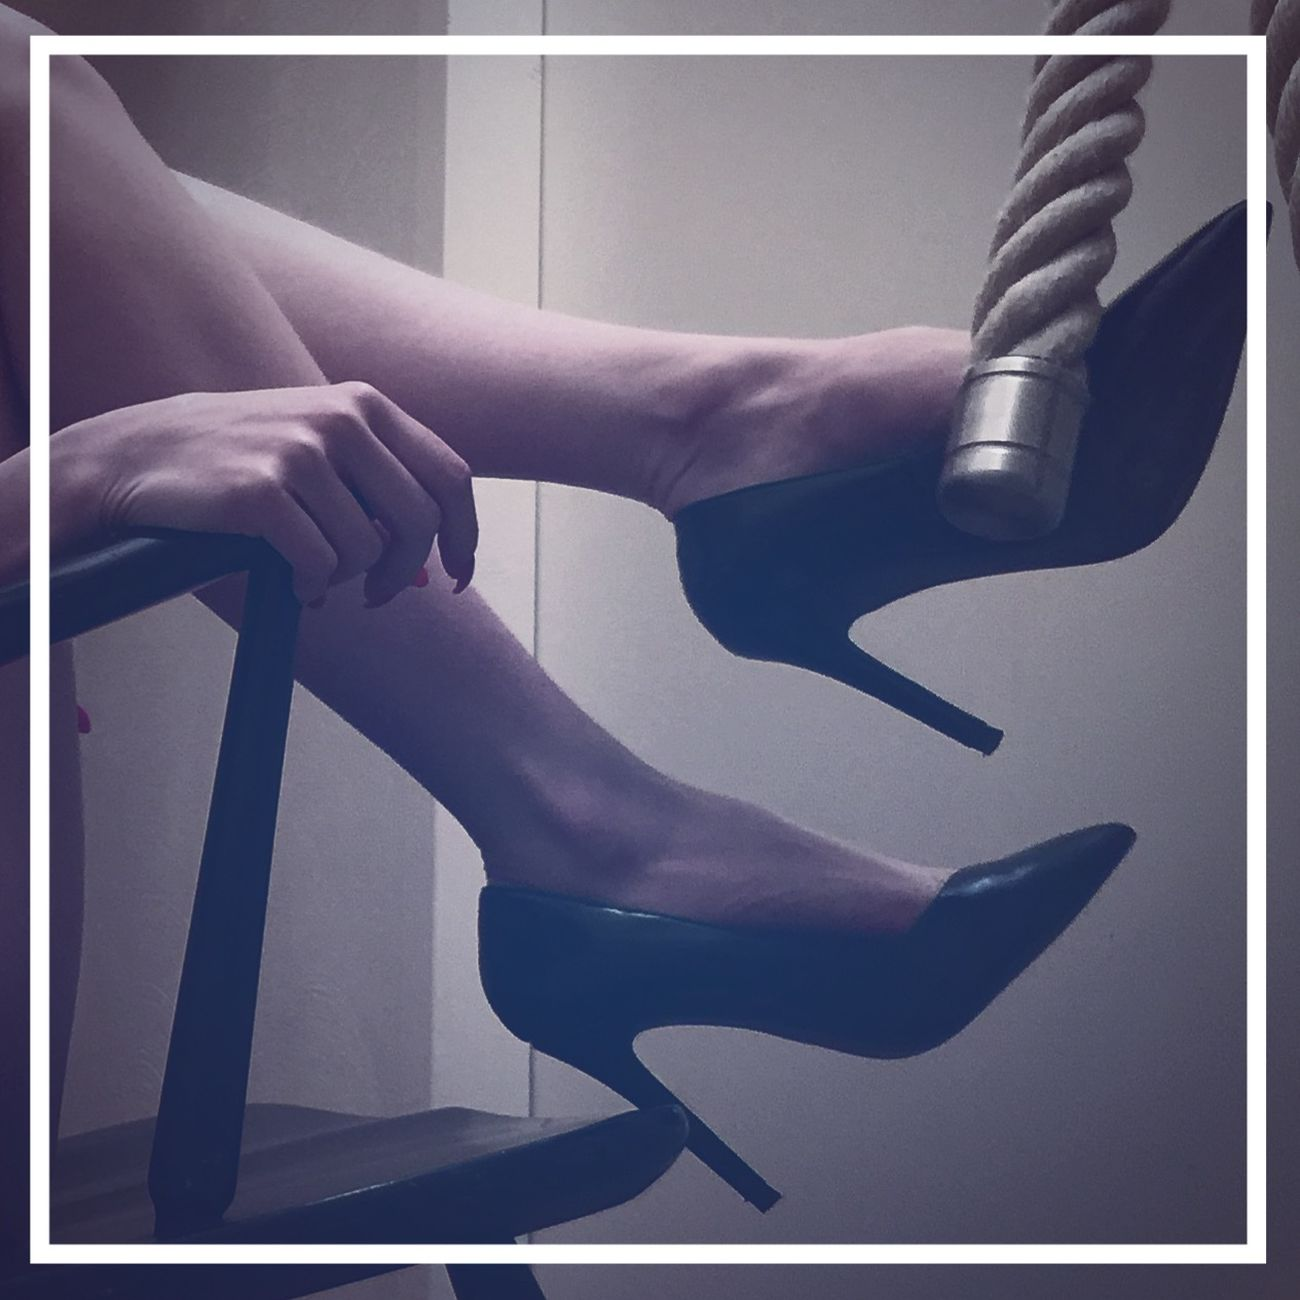 Lina Foot Fetish High Heels Seduction